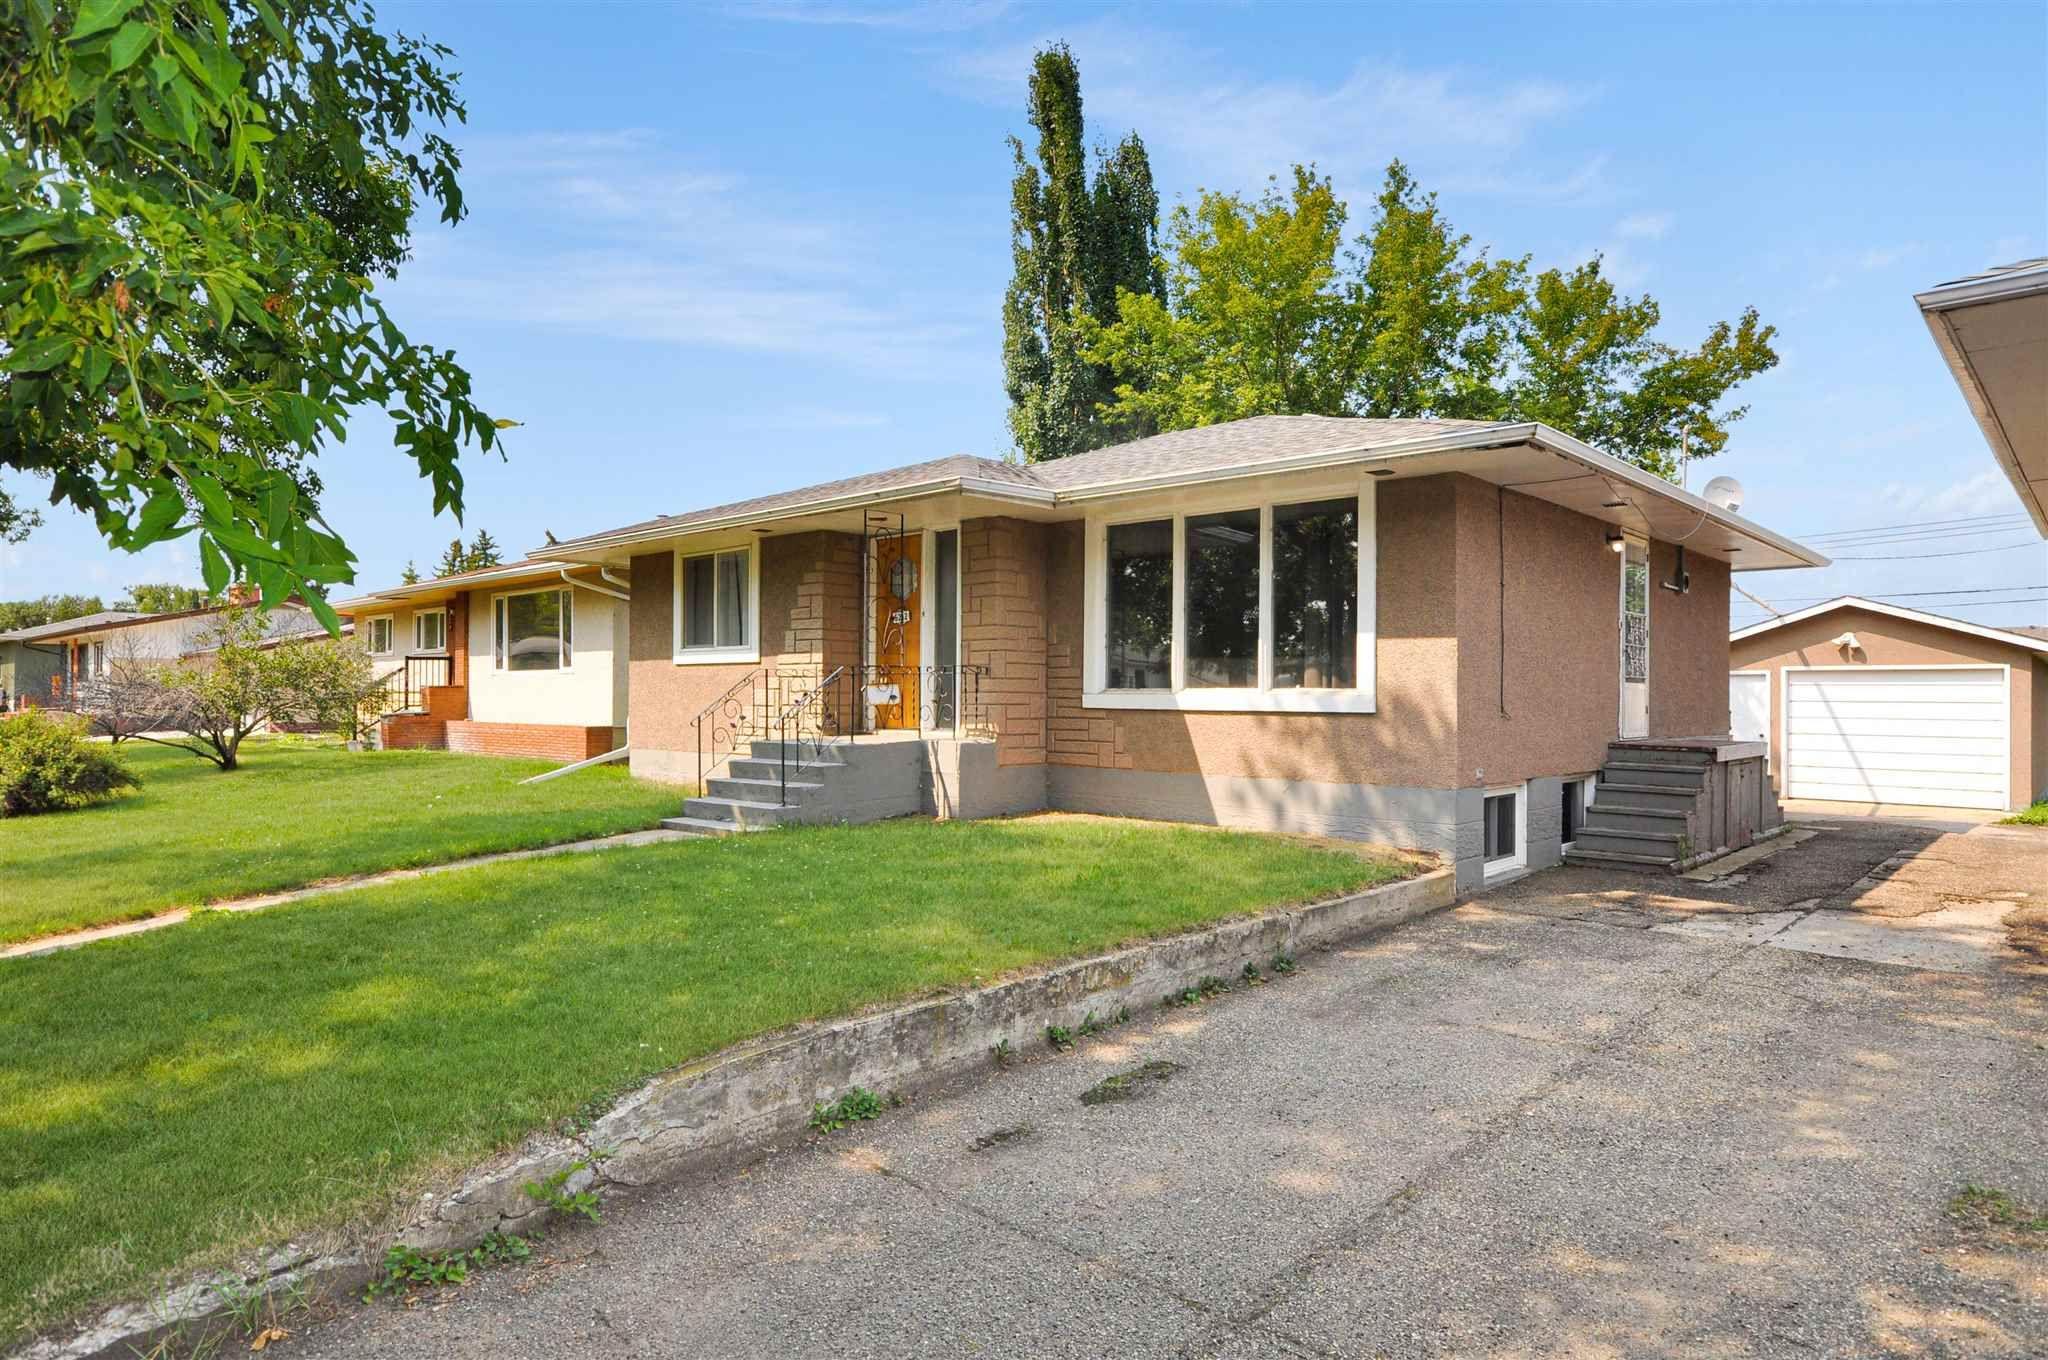 Main Photo: 5212 52 Avenue: Wetaskiwin House for sale : MLS®# E4264962